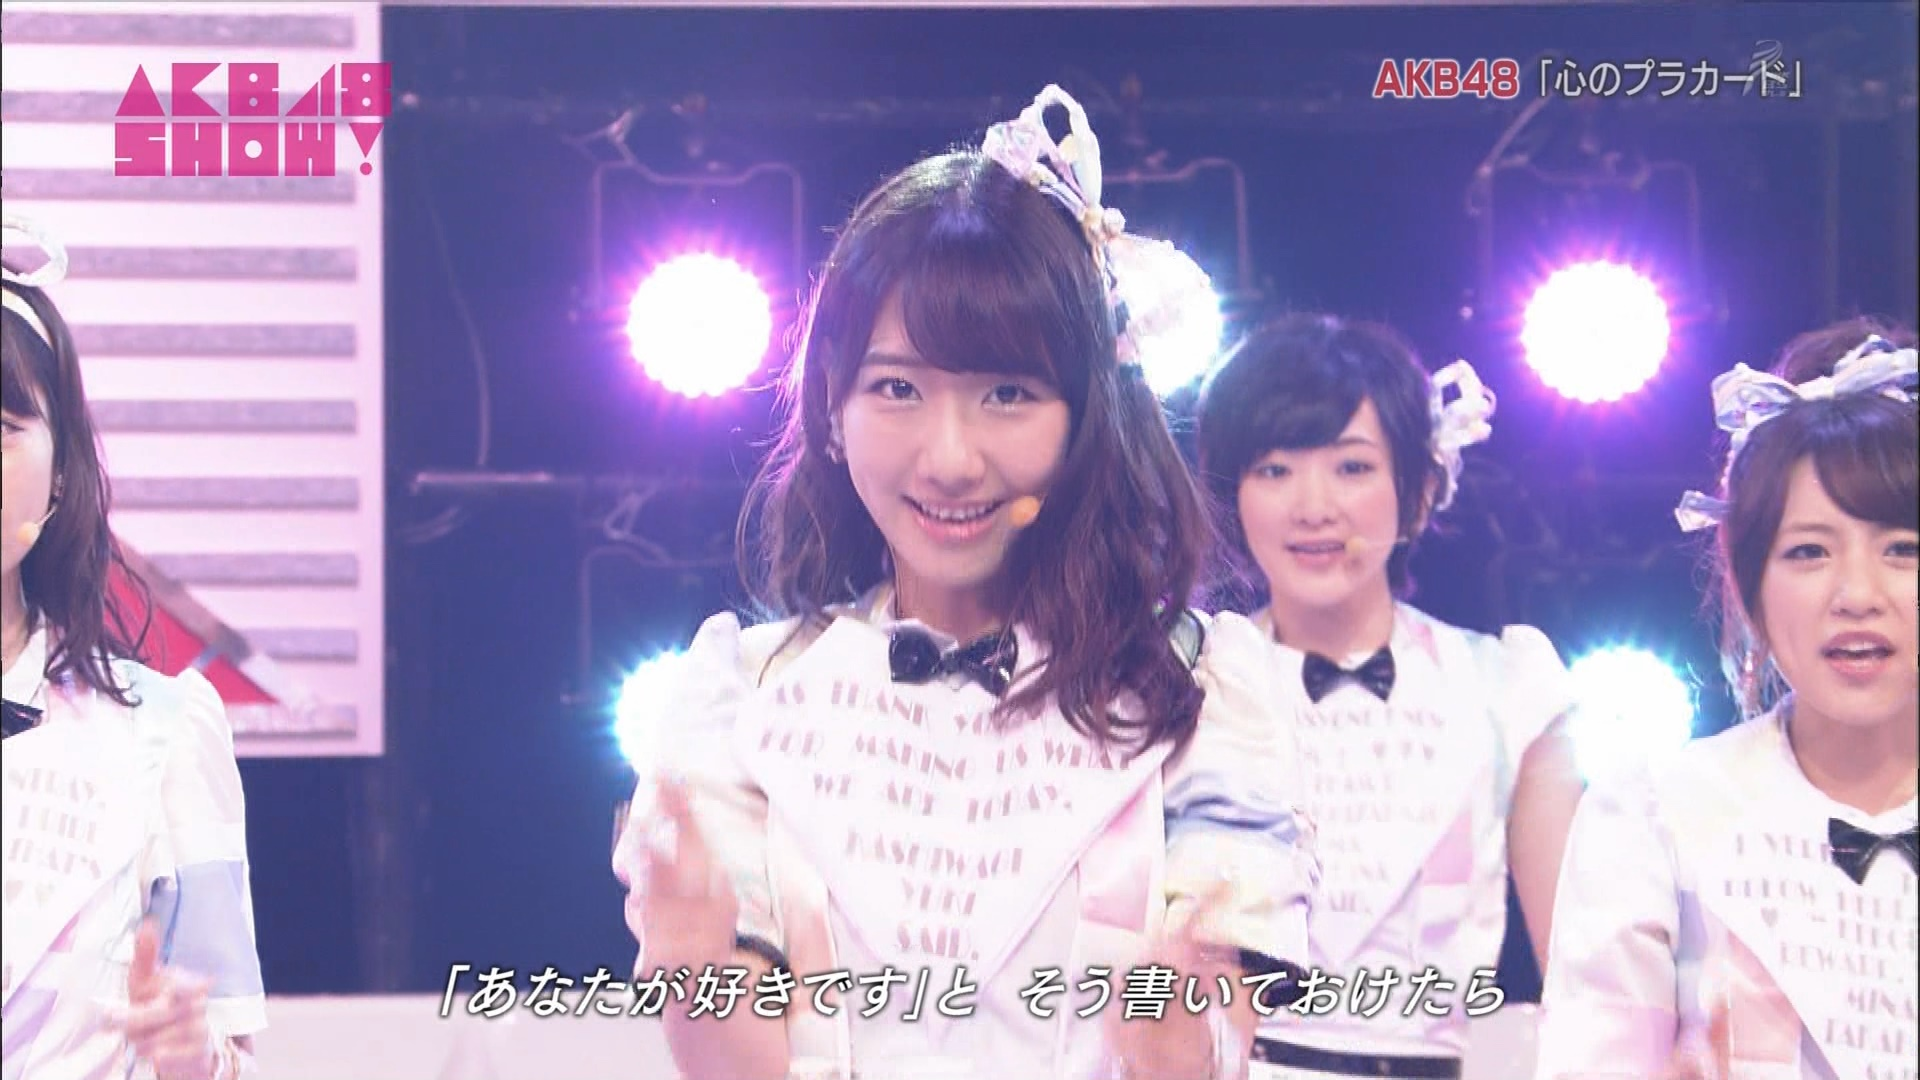 AKB48SHOW 心のプラカード 柏木由紀 20140830 (5)